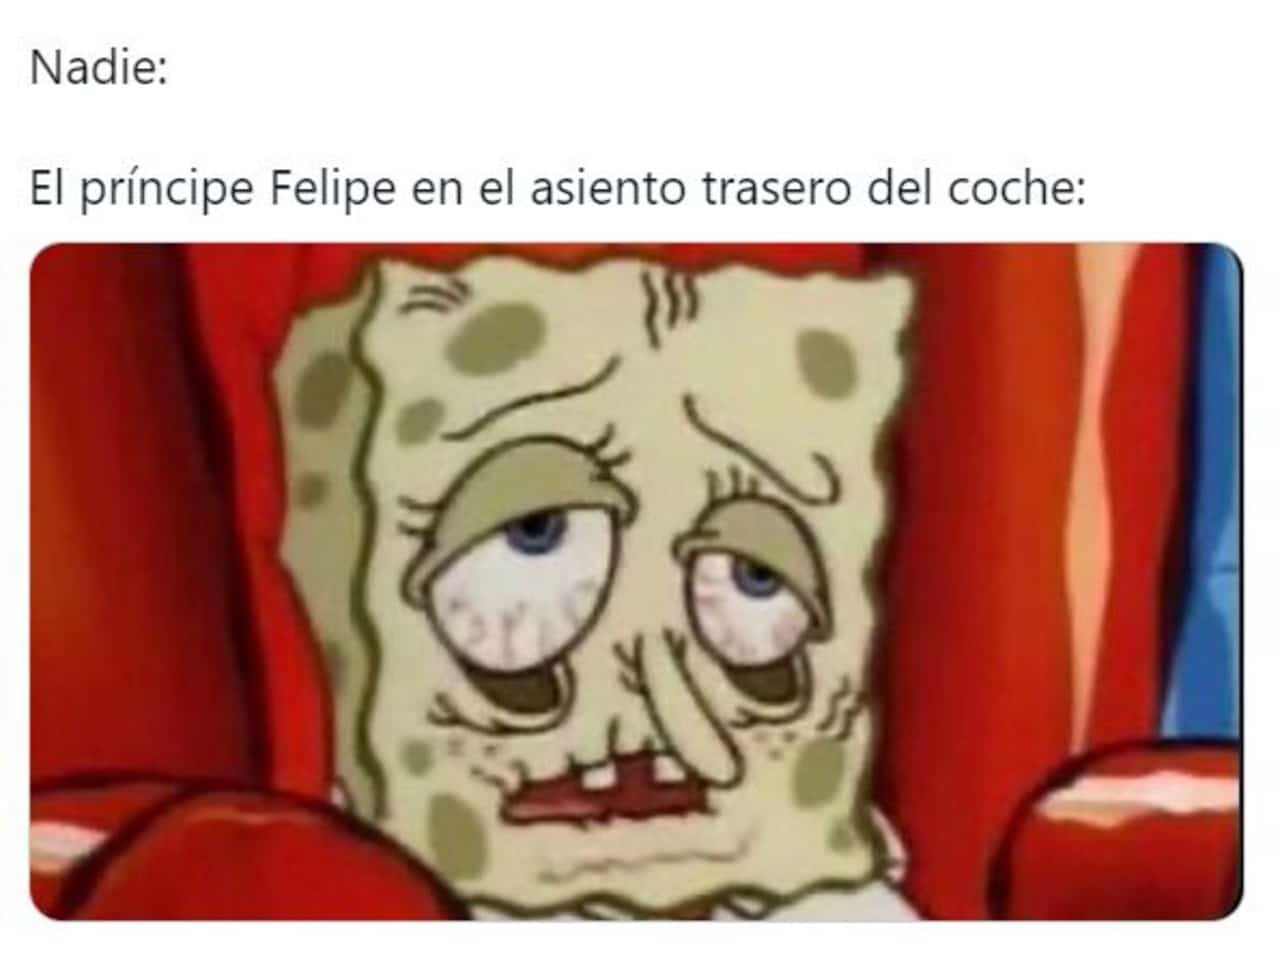 memes principe felipe hospital 99 años